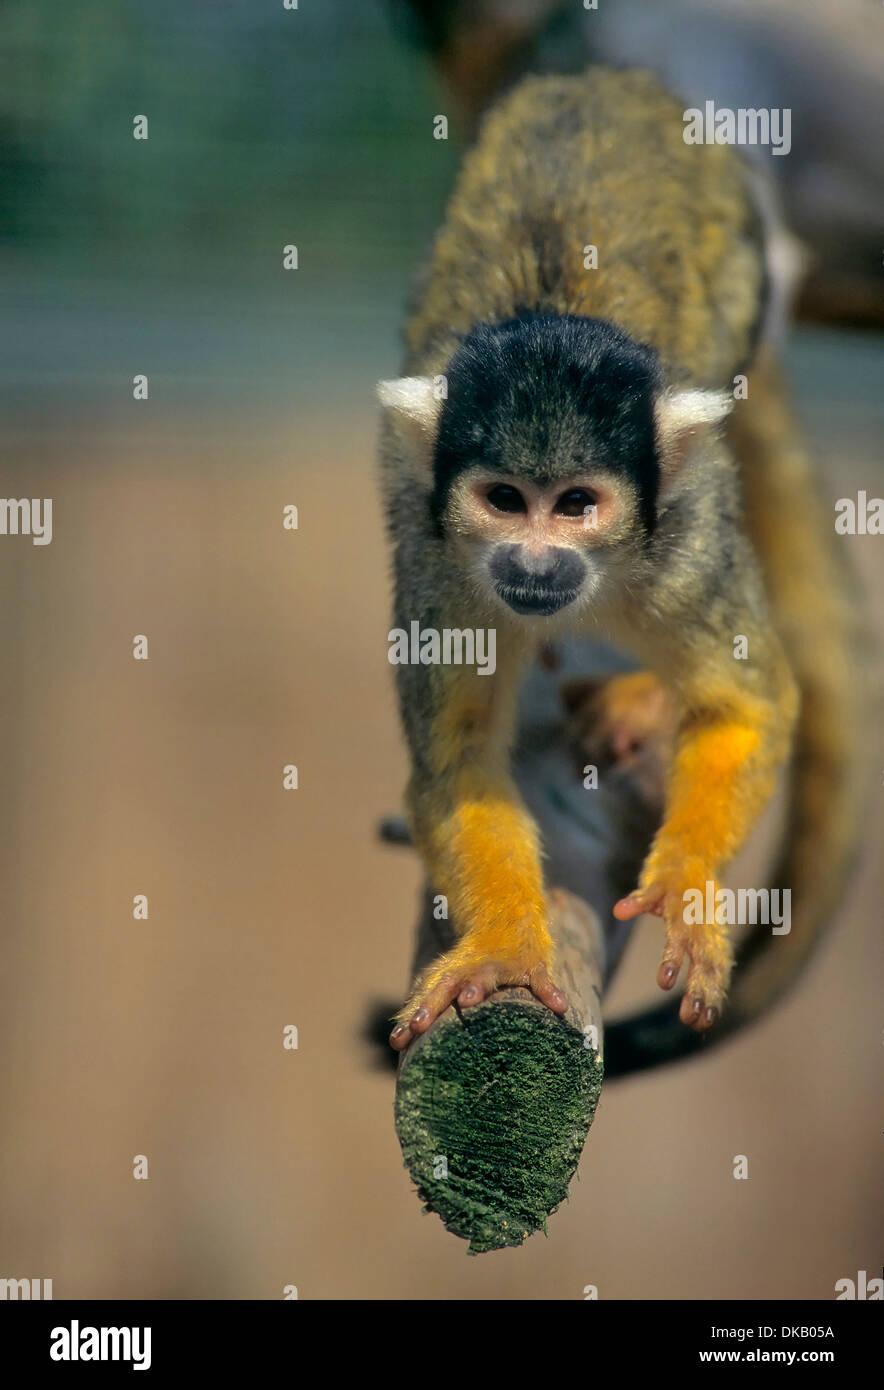 squirrel monkeys Saimiri, Zoo: Totenkopfaffen oder Totenkopfäffchen (Saimiri) Stock Photo